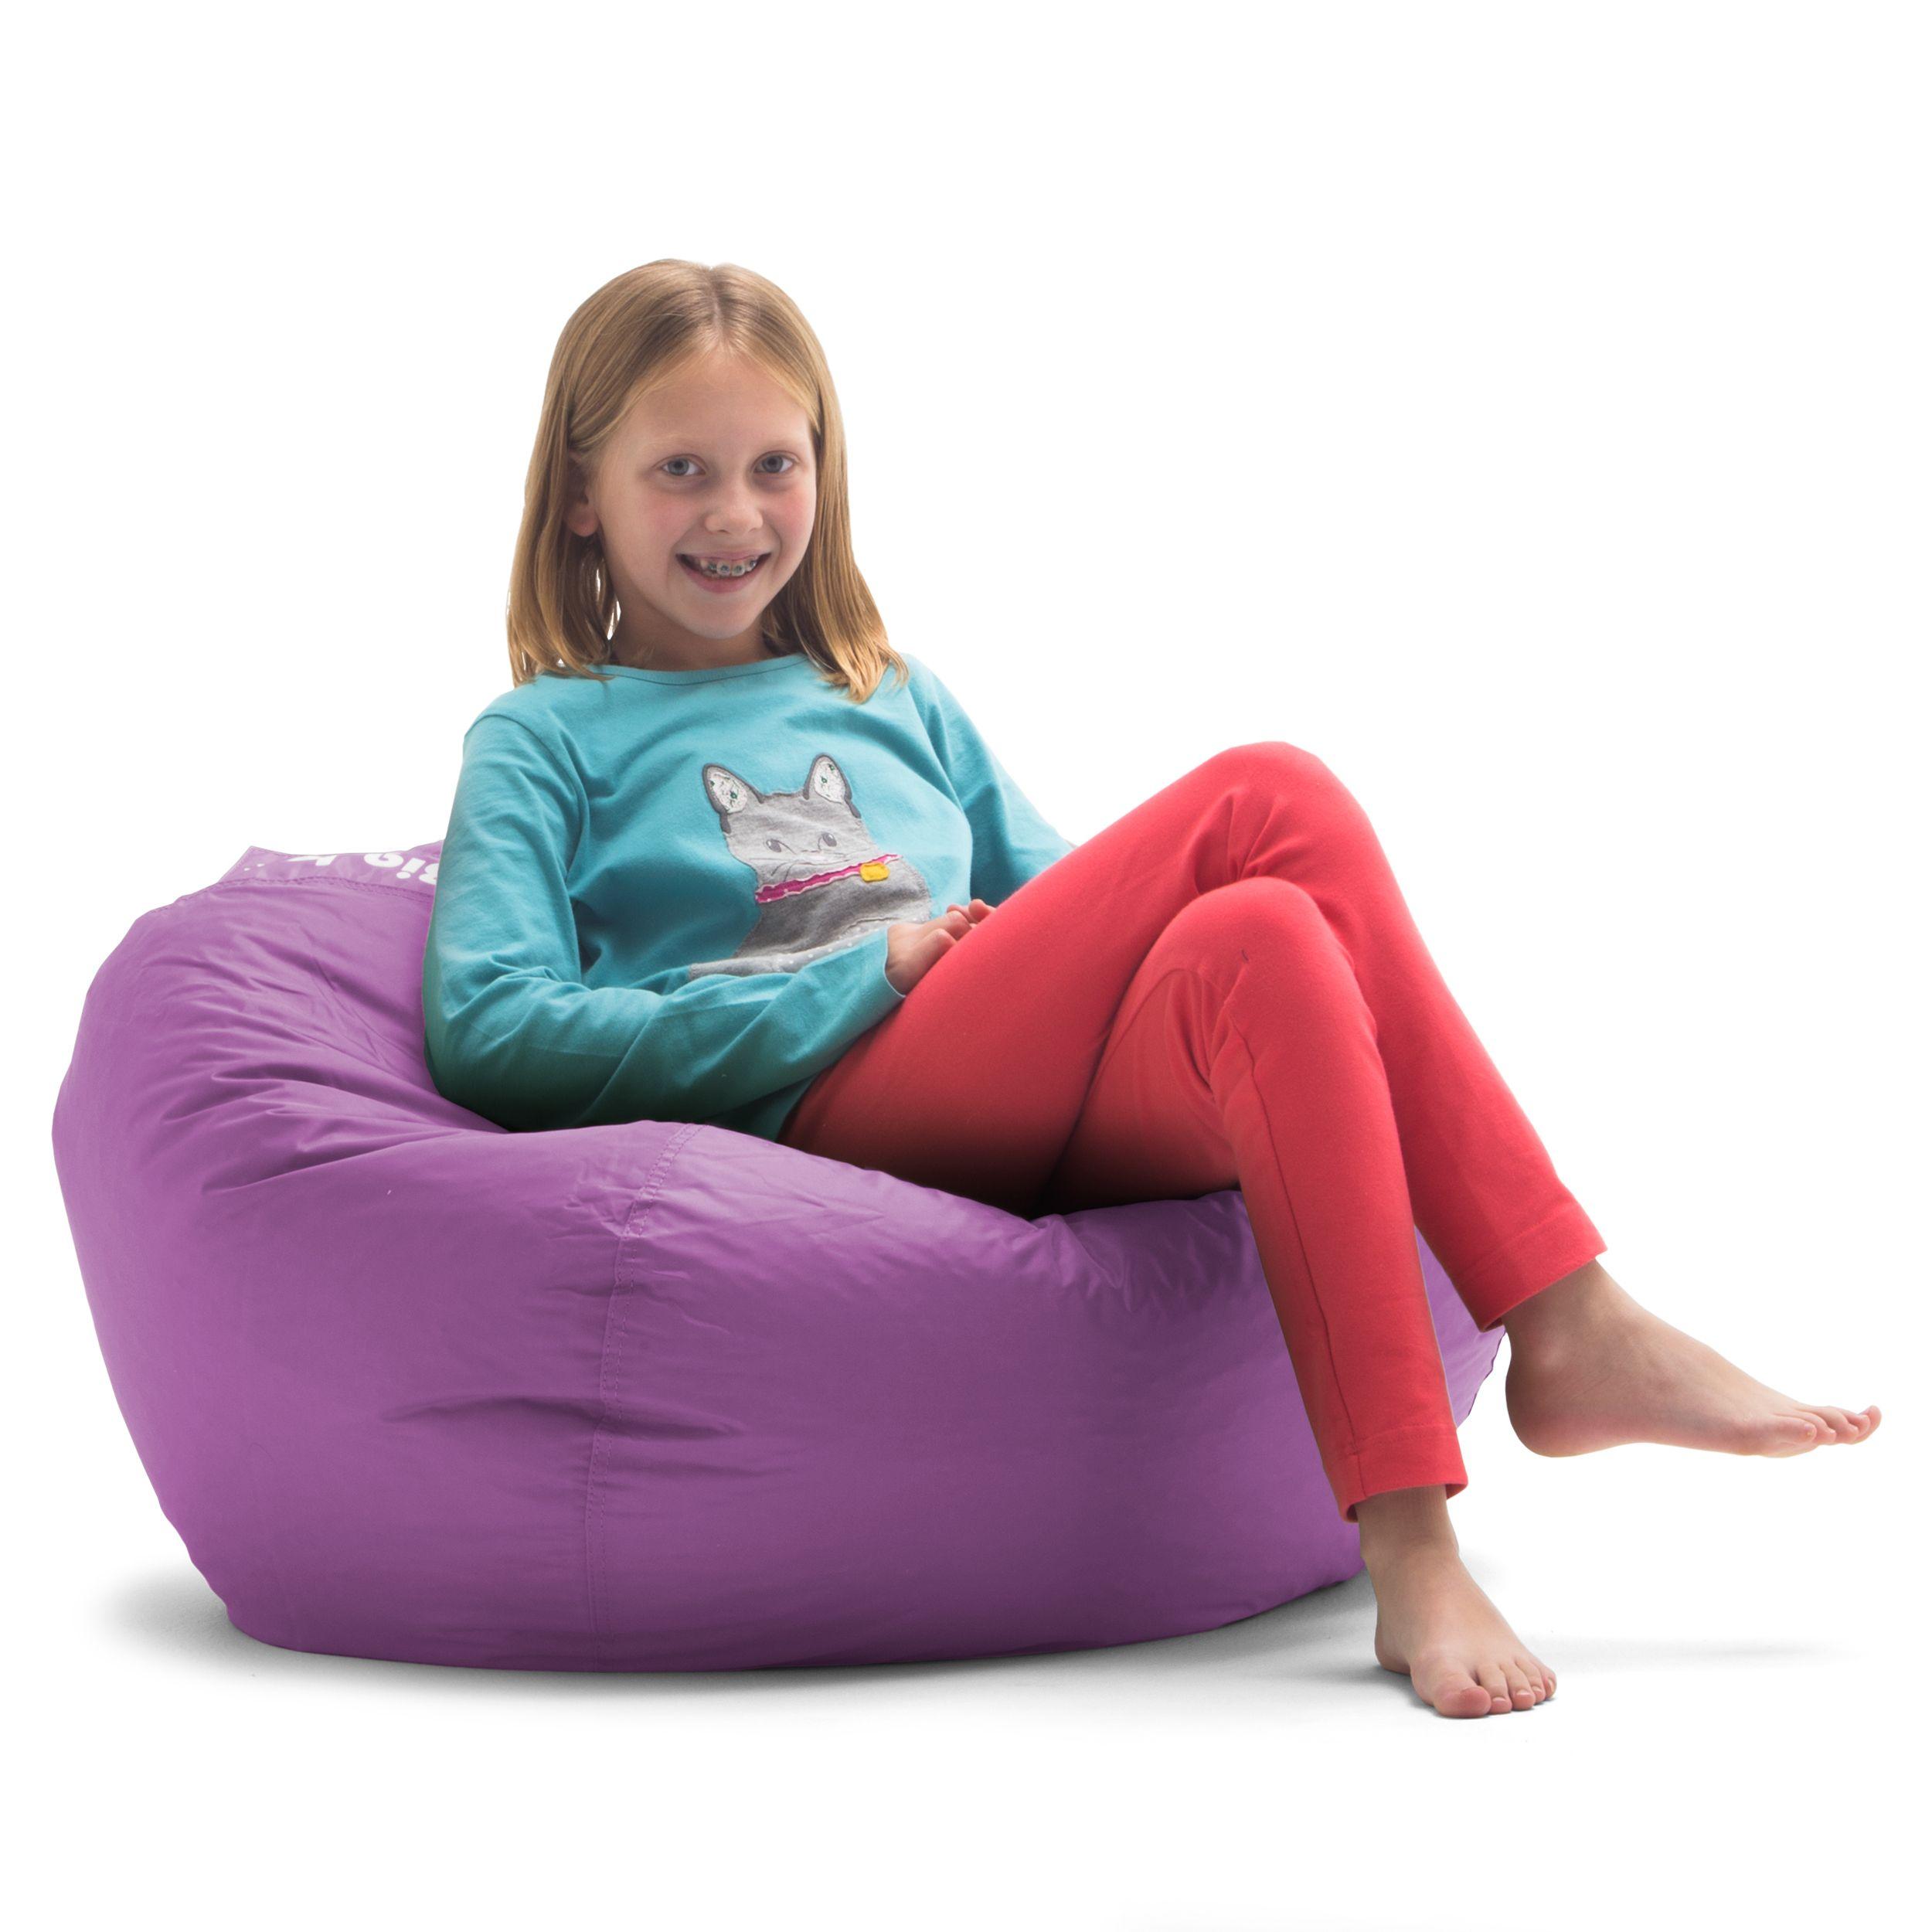 98 big joe round bean bag chair multiple colors